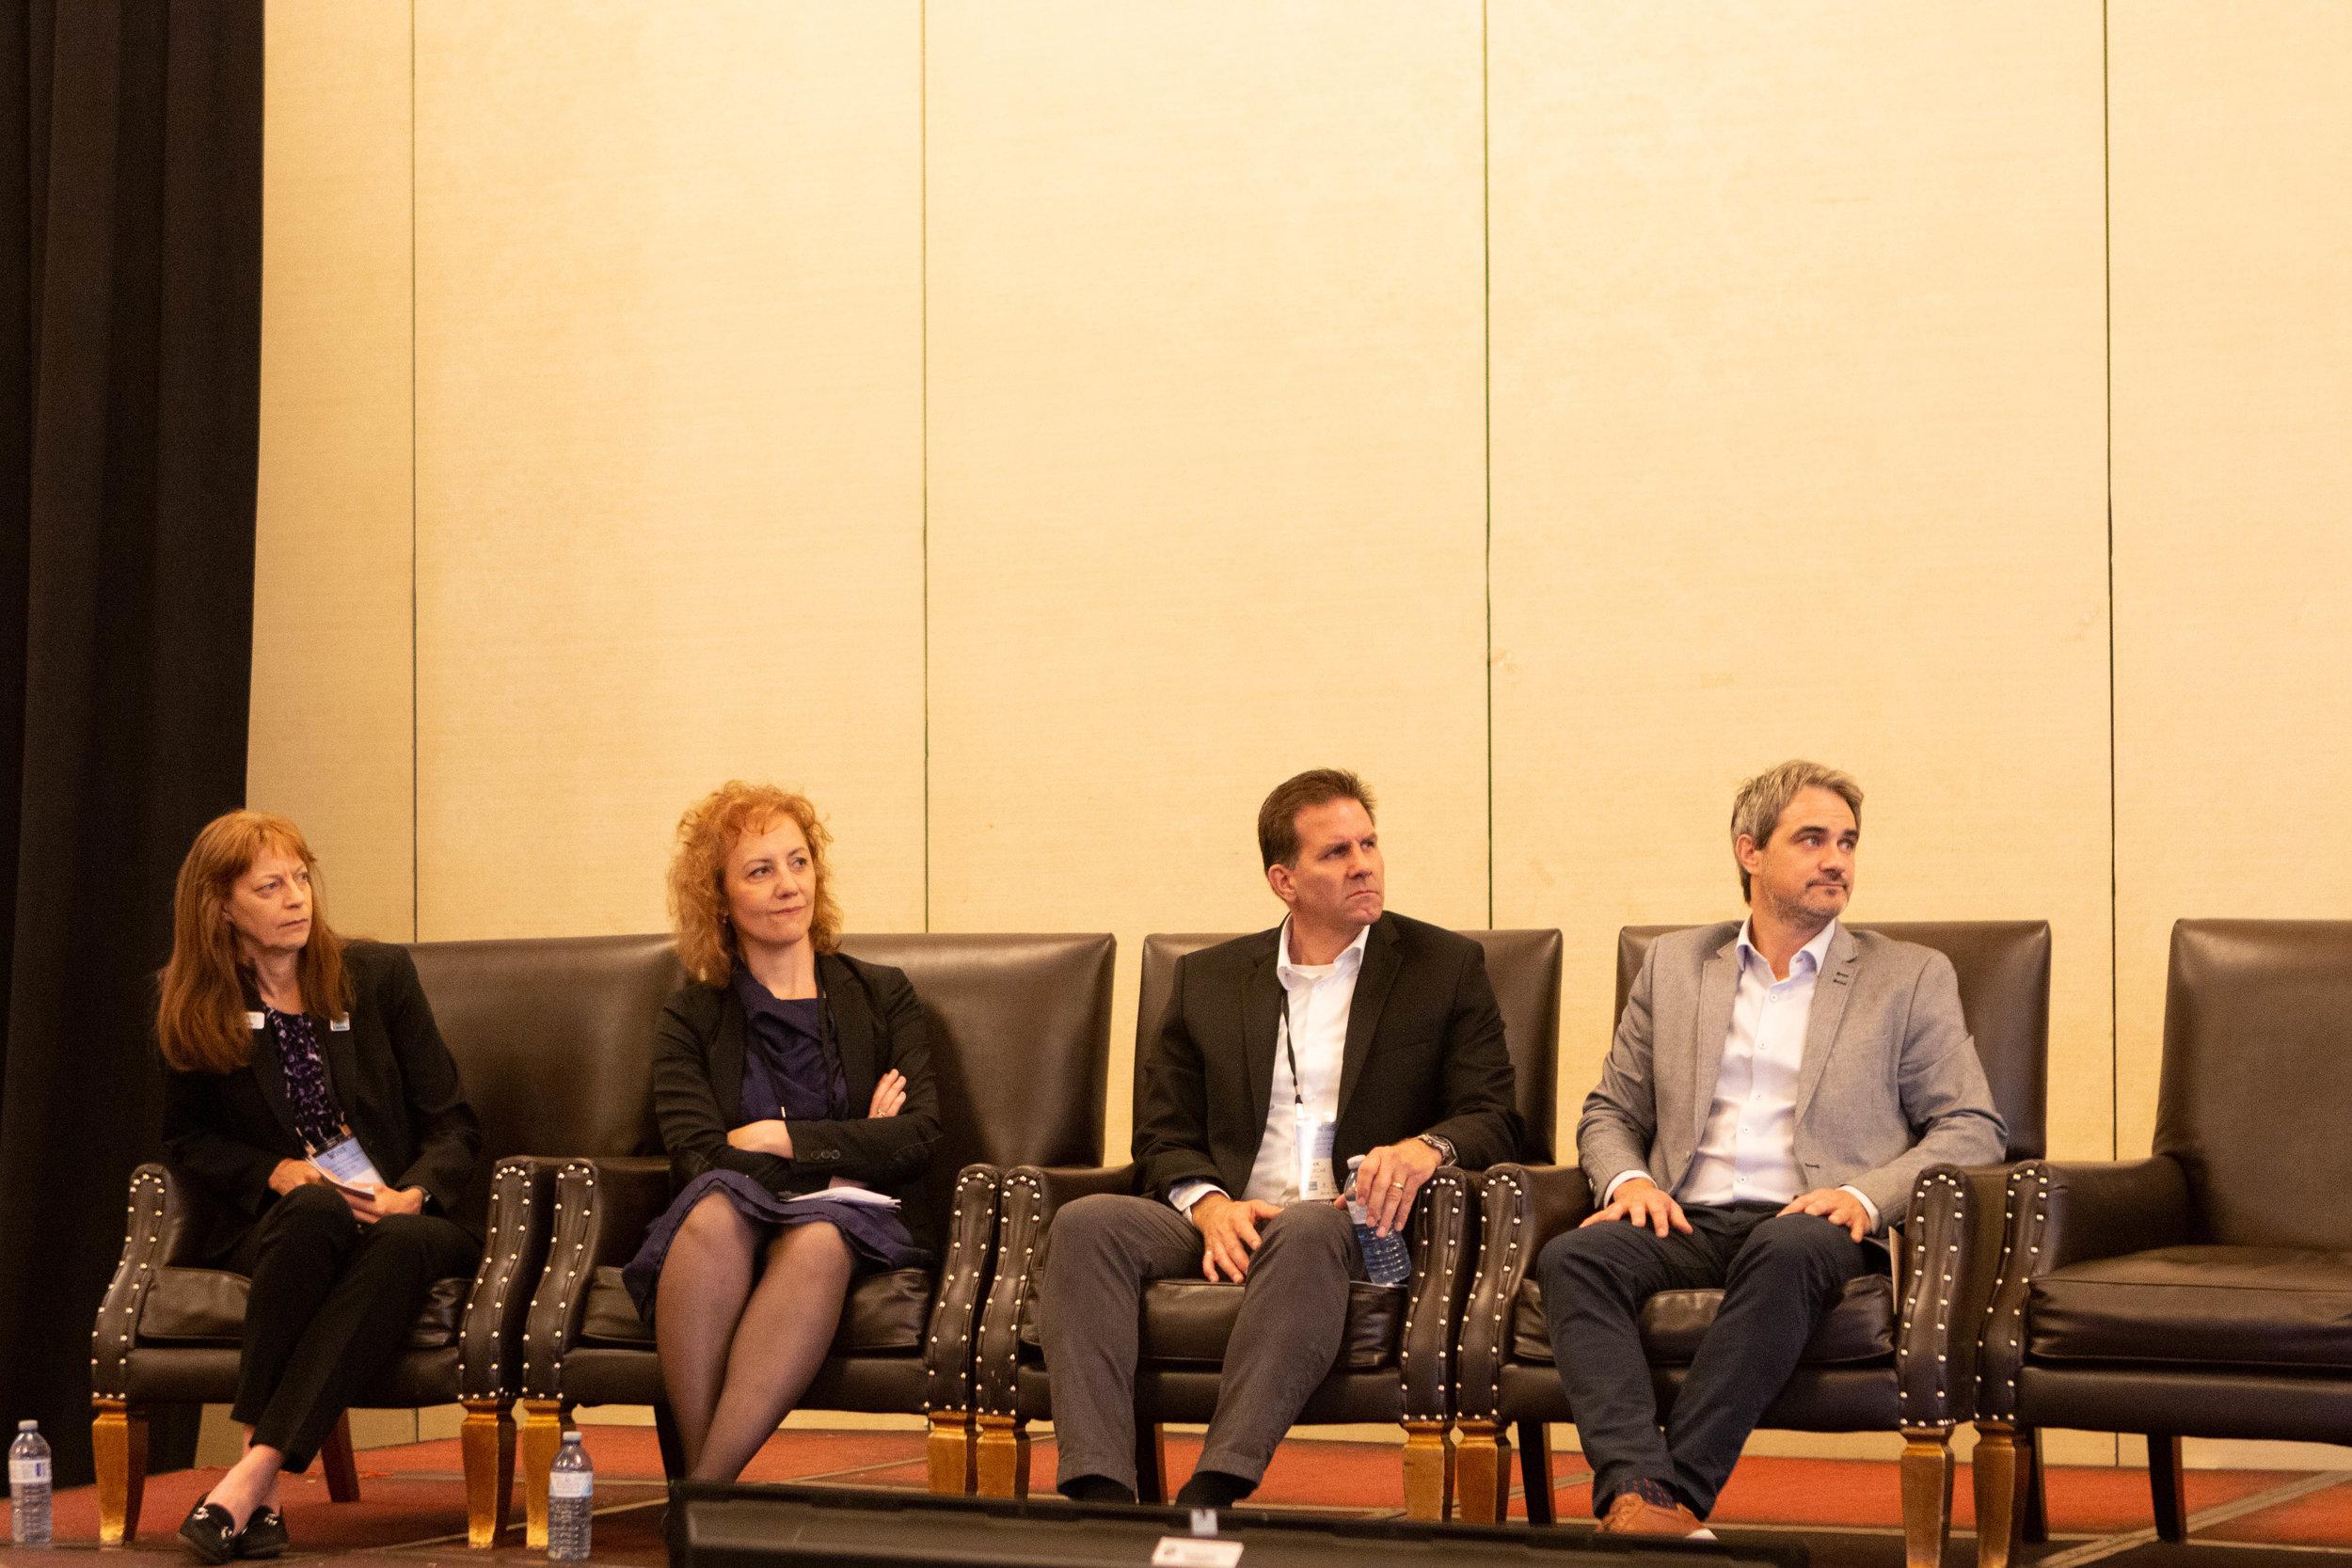 Panel: Shanna Knights - Ballard Power Systems Inc. ; Michel Archambault - Hydrogenics ; Kirk Burcar - New Flyer ; Ana Maria Suknovic - Government of Ontario